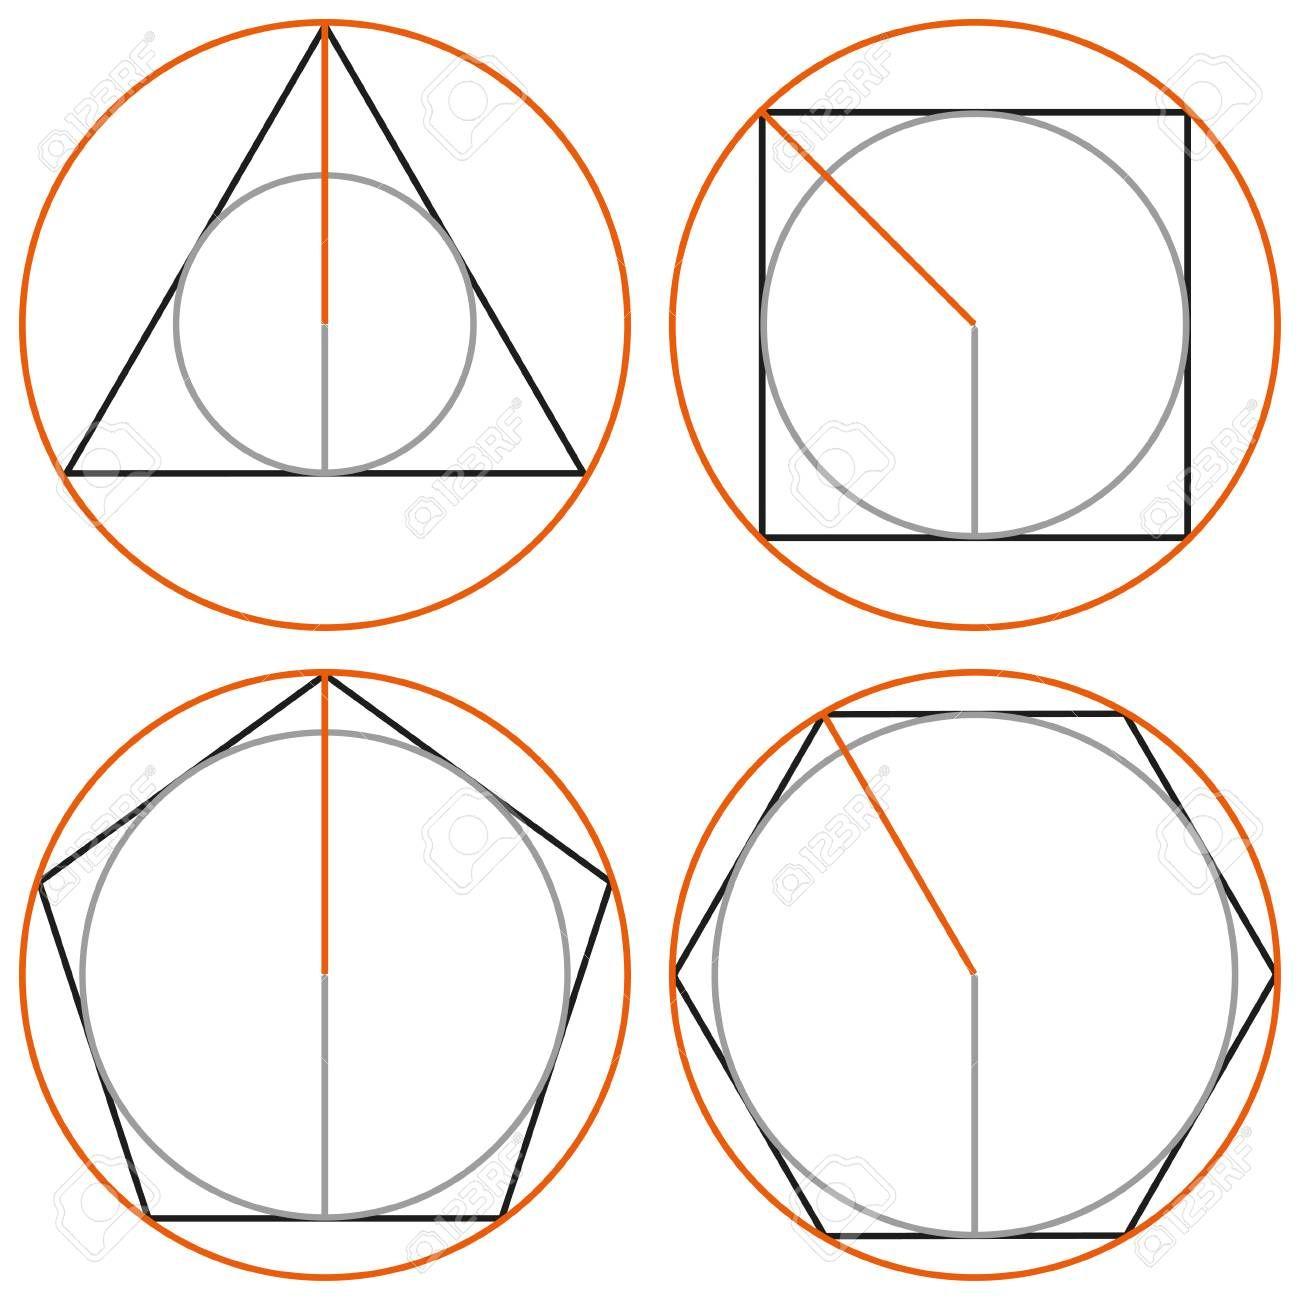 Circle And Polygon Circle Inscribed In A Polygon Circle